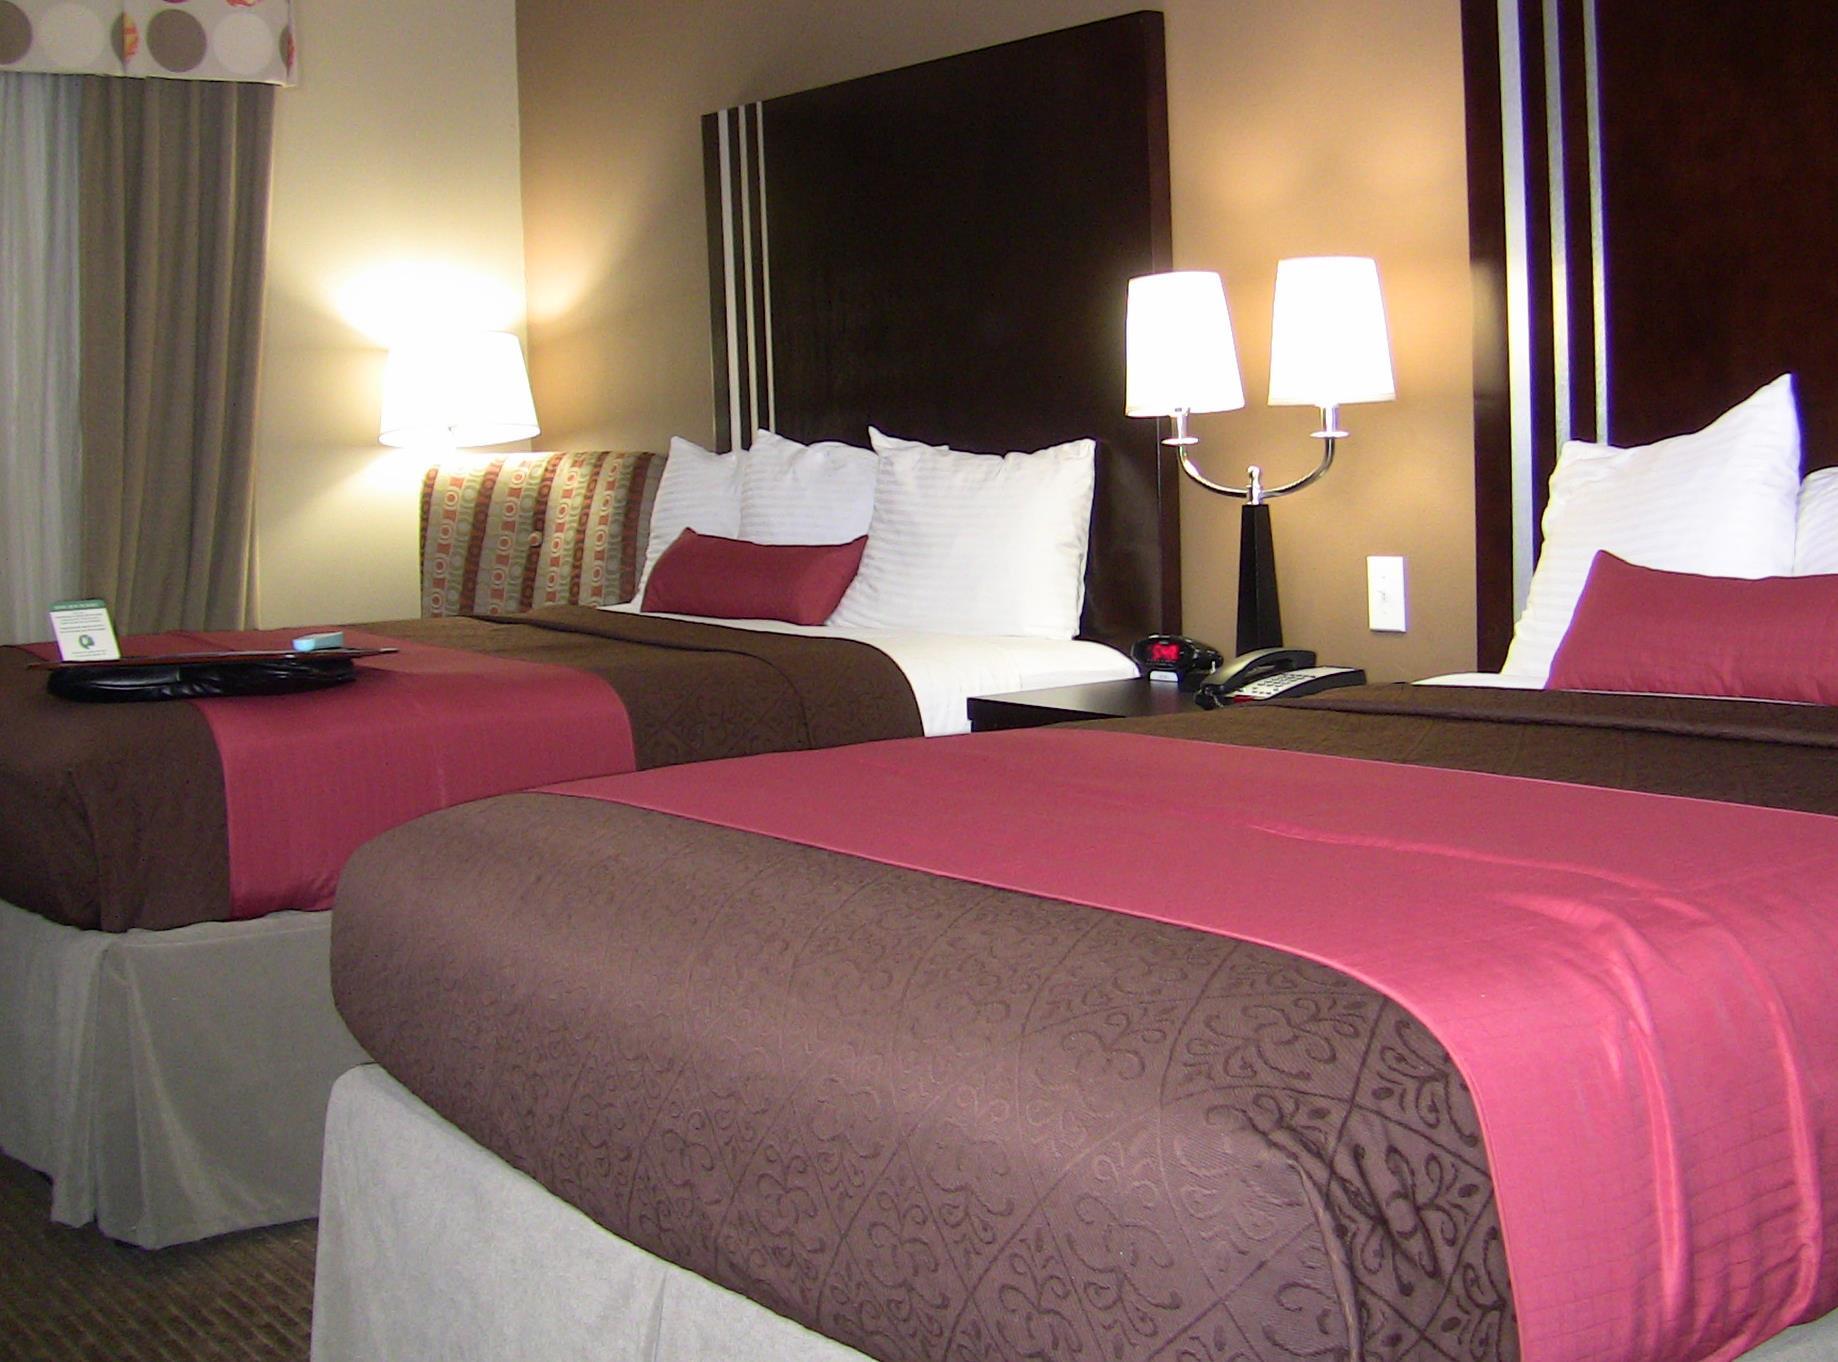 Best Western Plus Texoma Hotel & Suites image 15